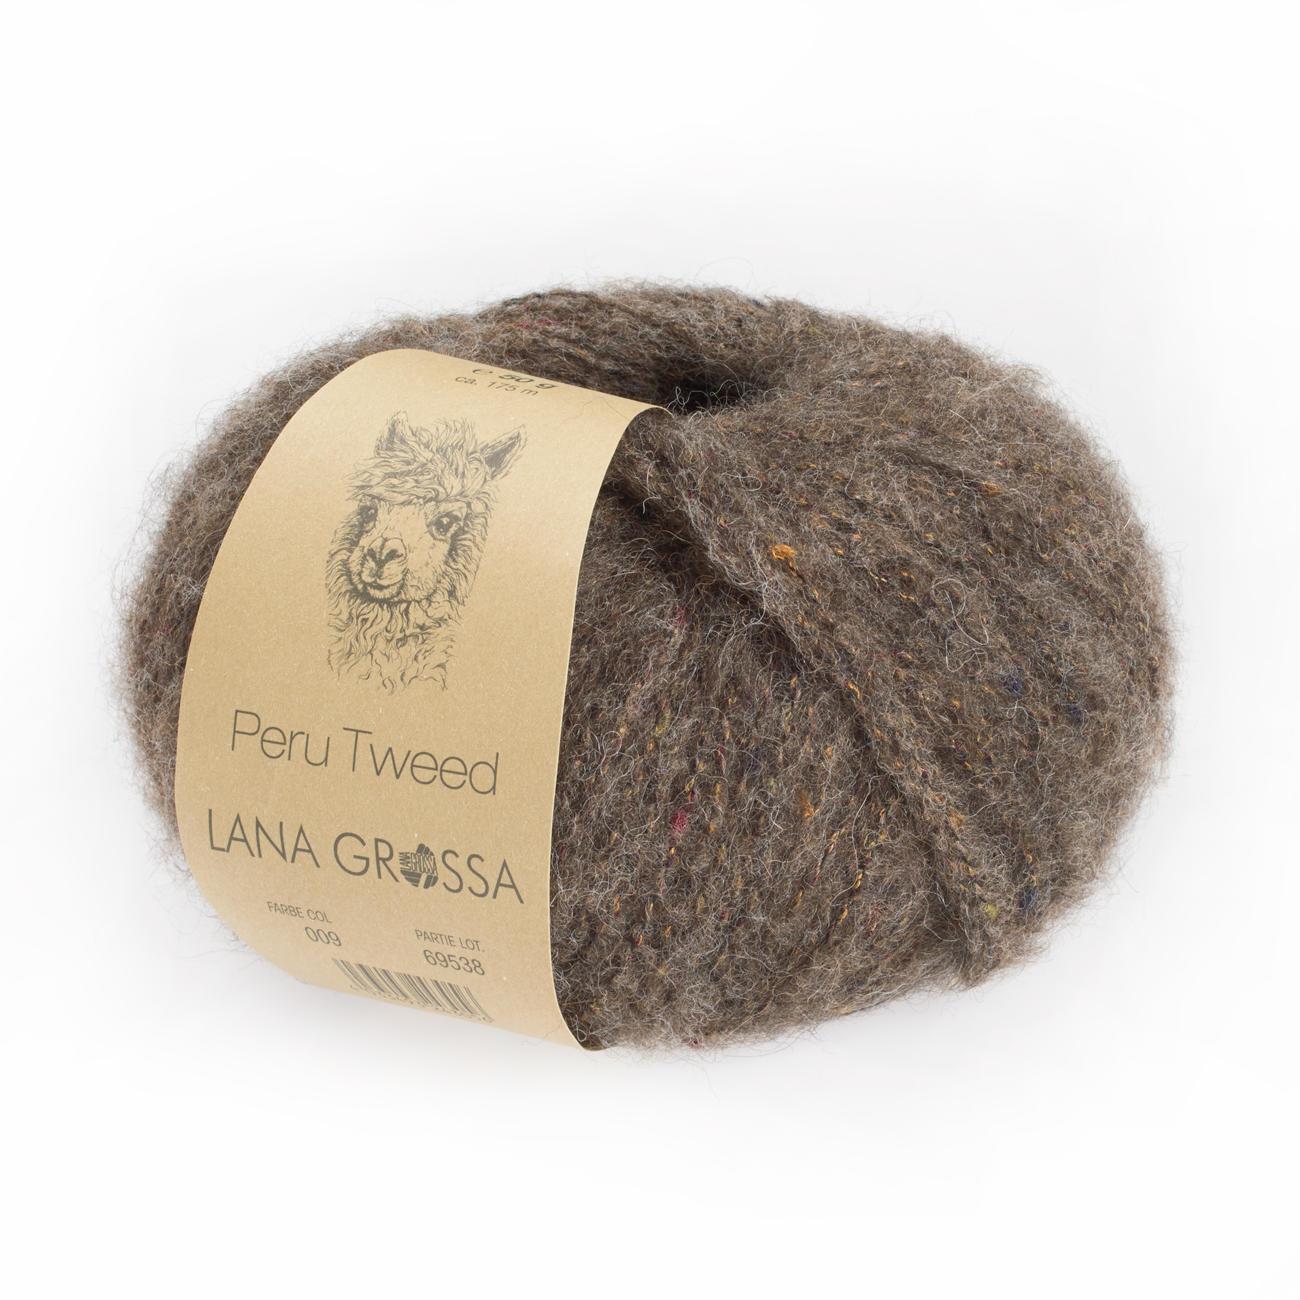 Lana Grossa Peru Tweed Wolle Kreativ Fb 8 goldbraun 50 g